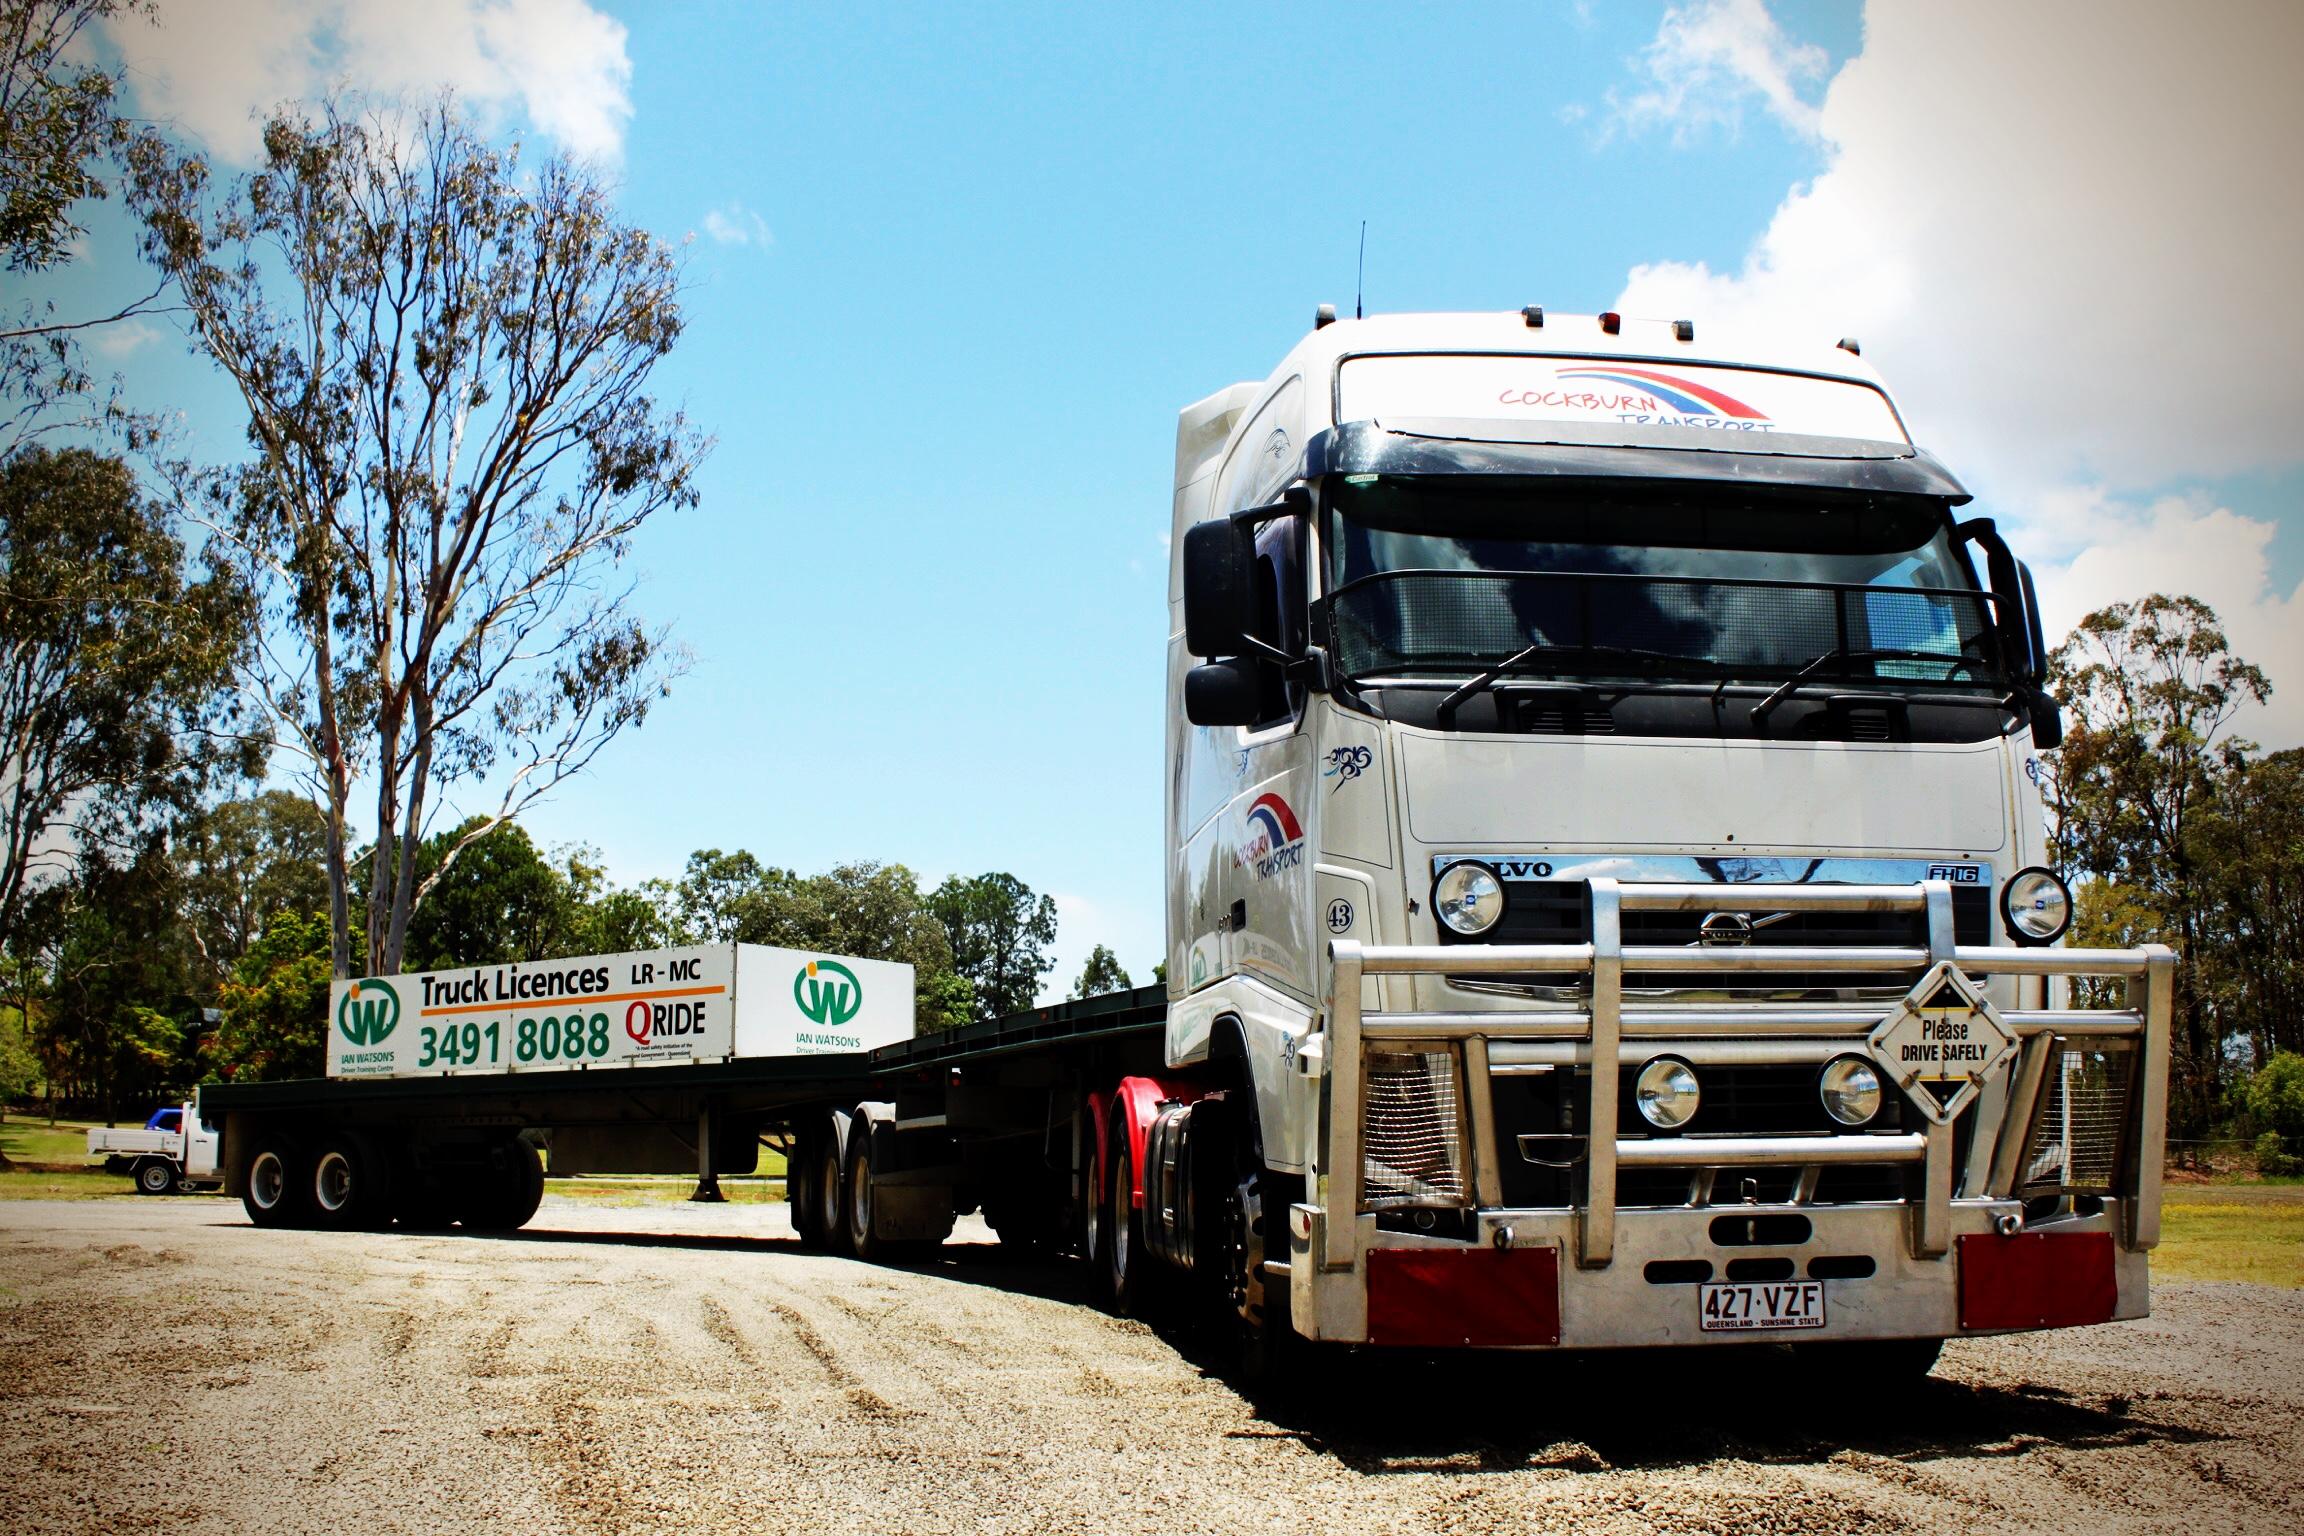 Ian Watson's Truck Driving School's Volvo FH16